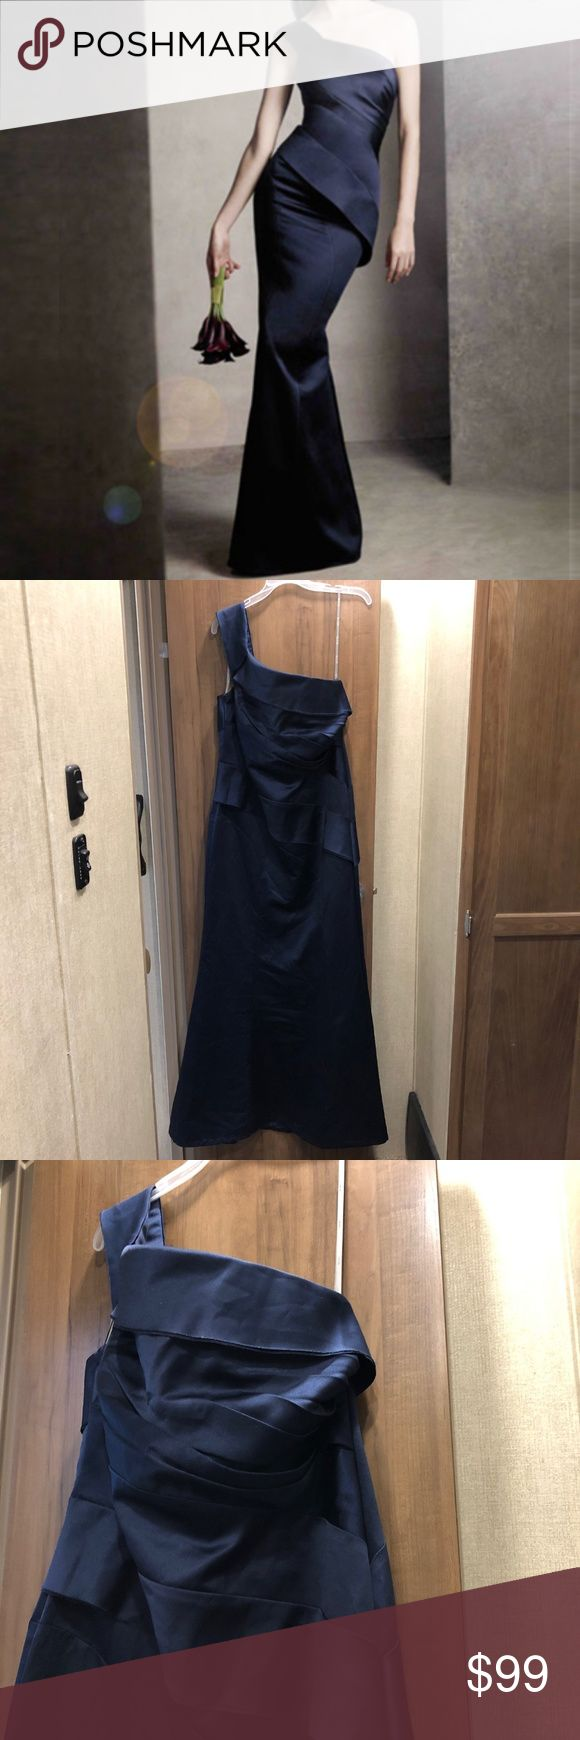 Vera Wang Evening Gown Size 14 (runs small) White By Vera Wang. One Shoulder Dar…